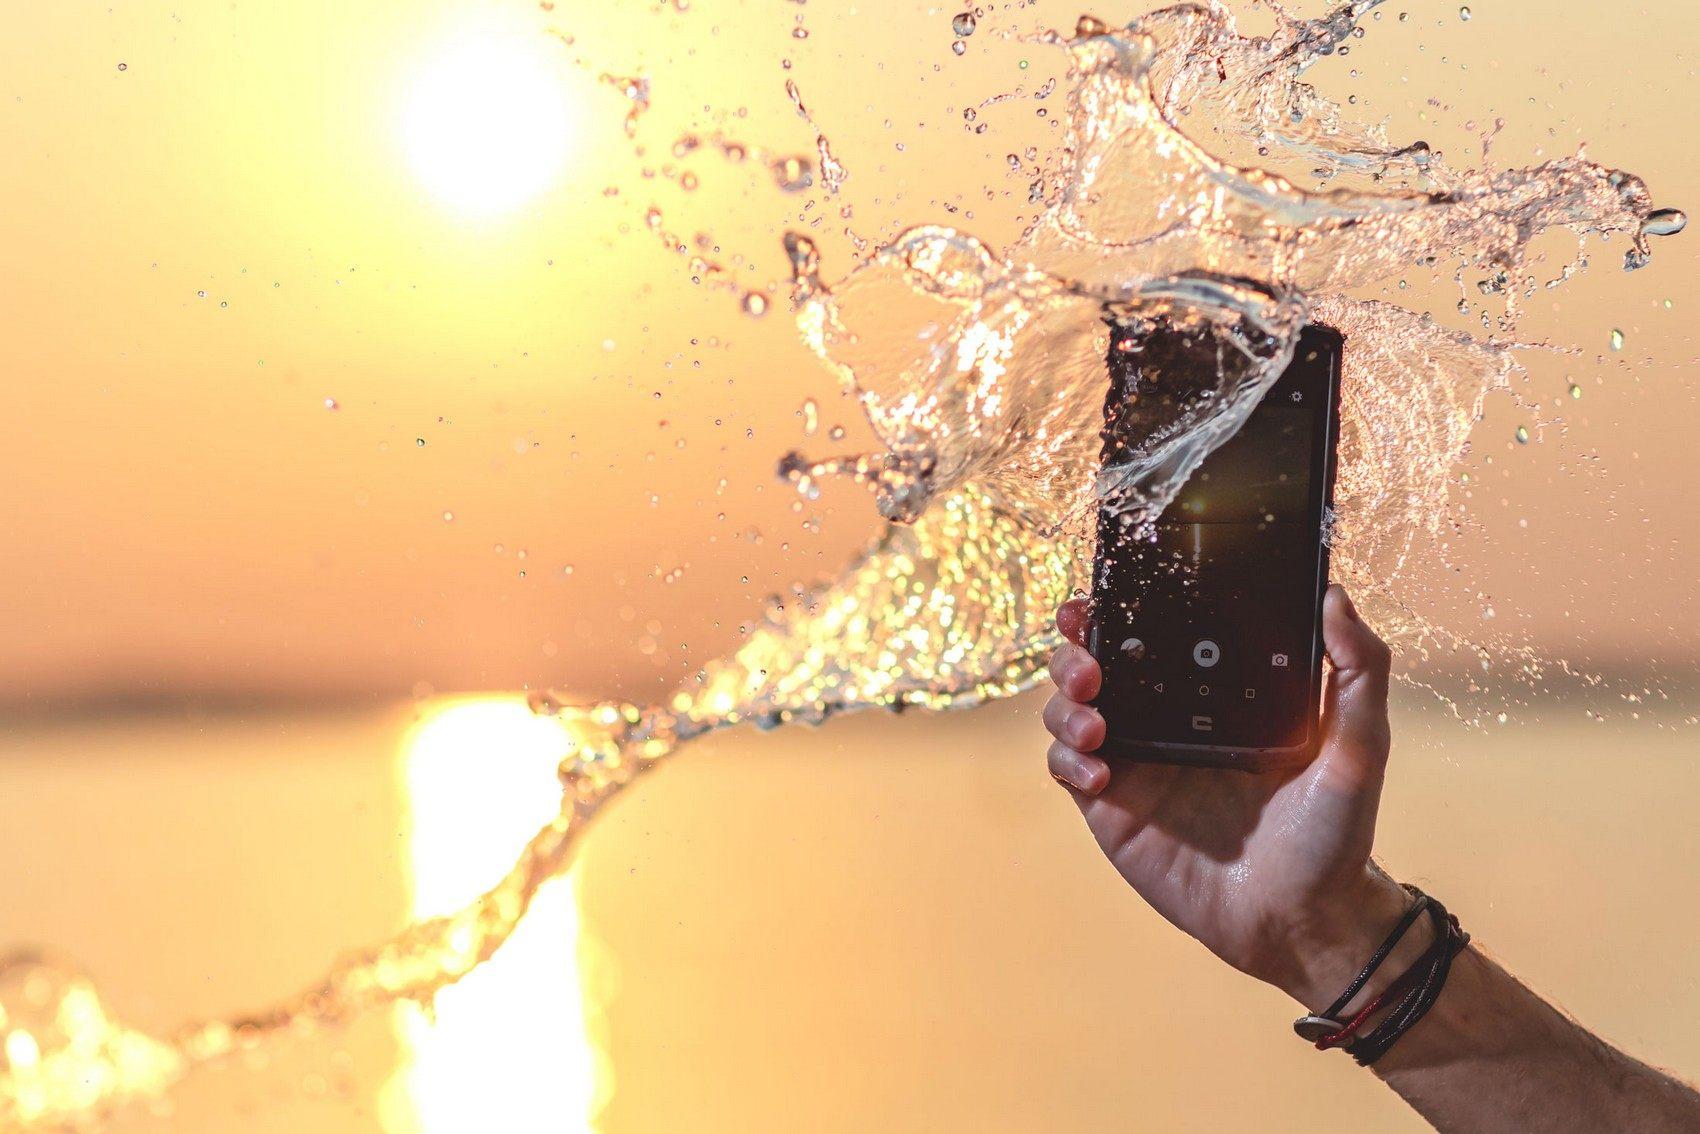 acheter smartphone etanche